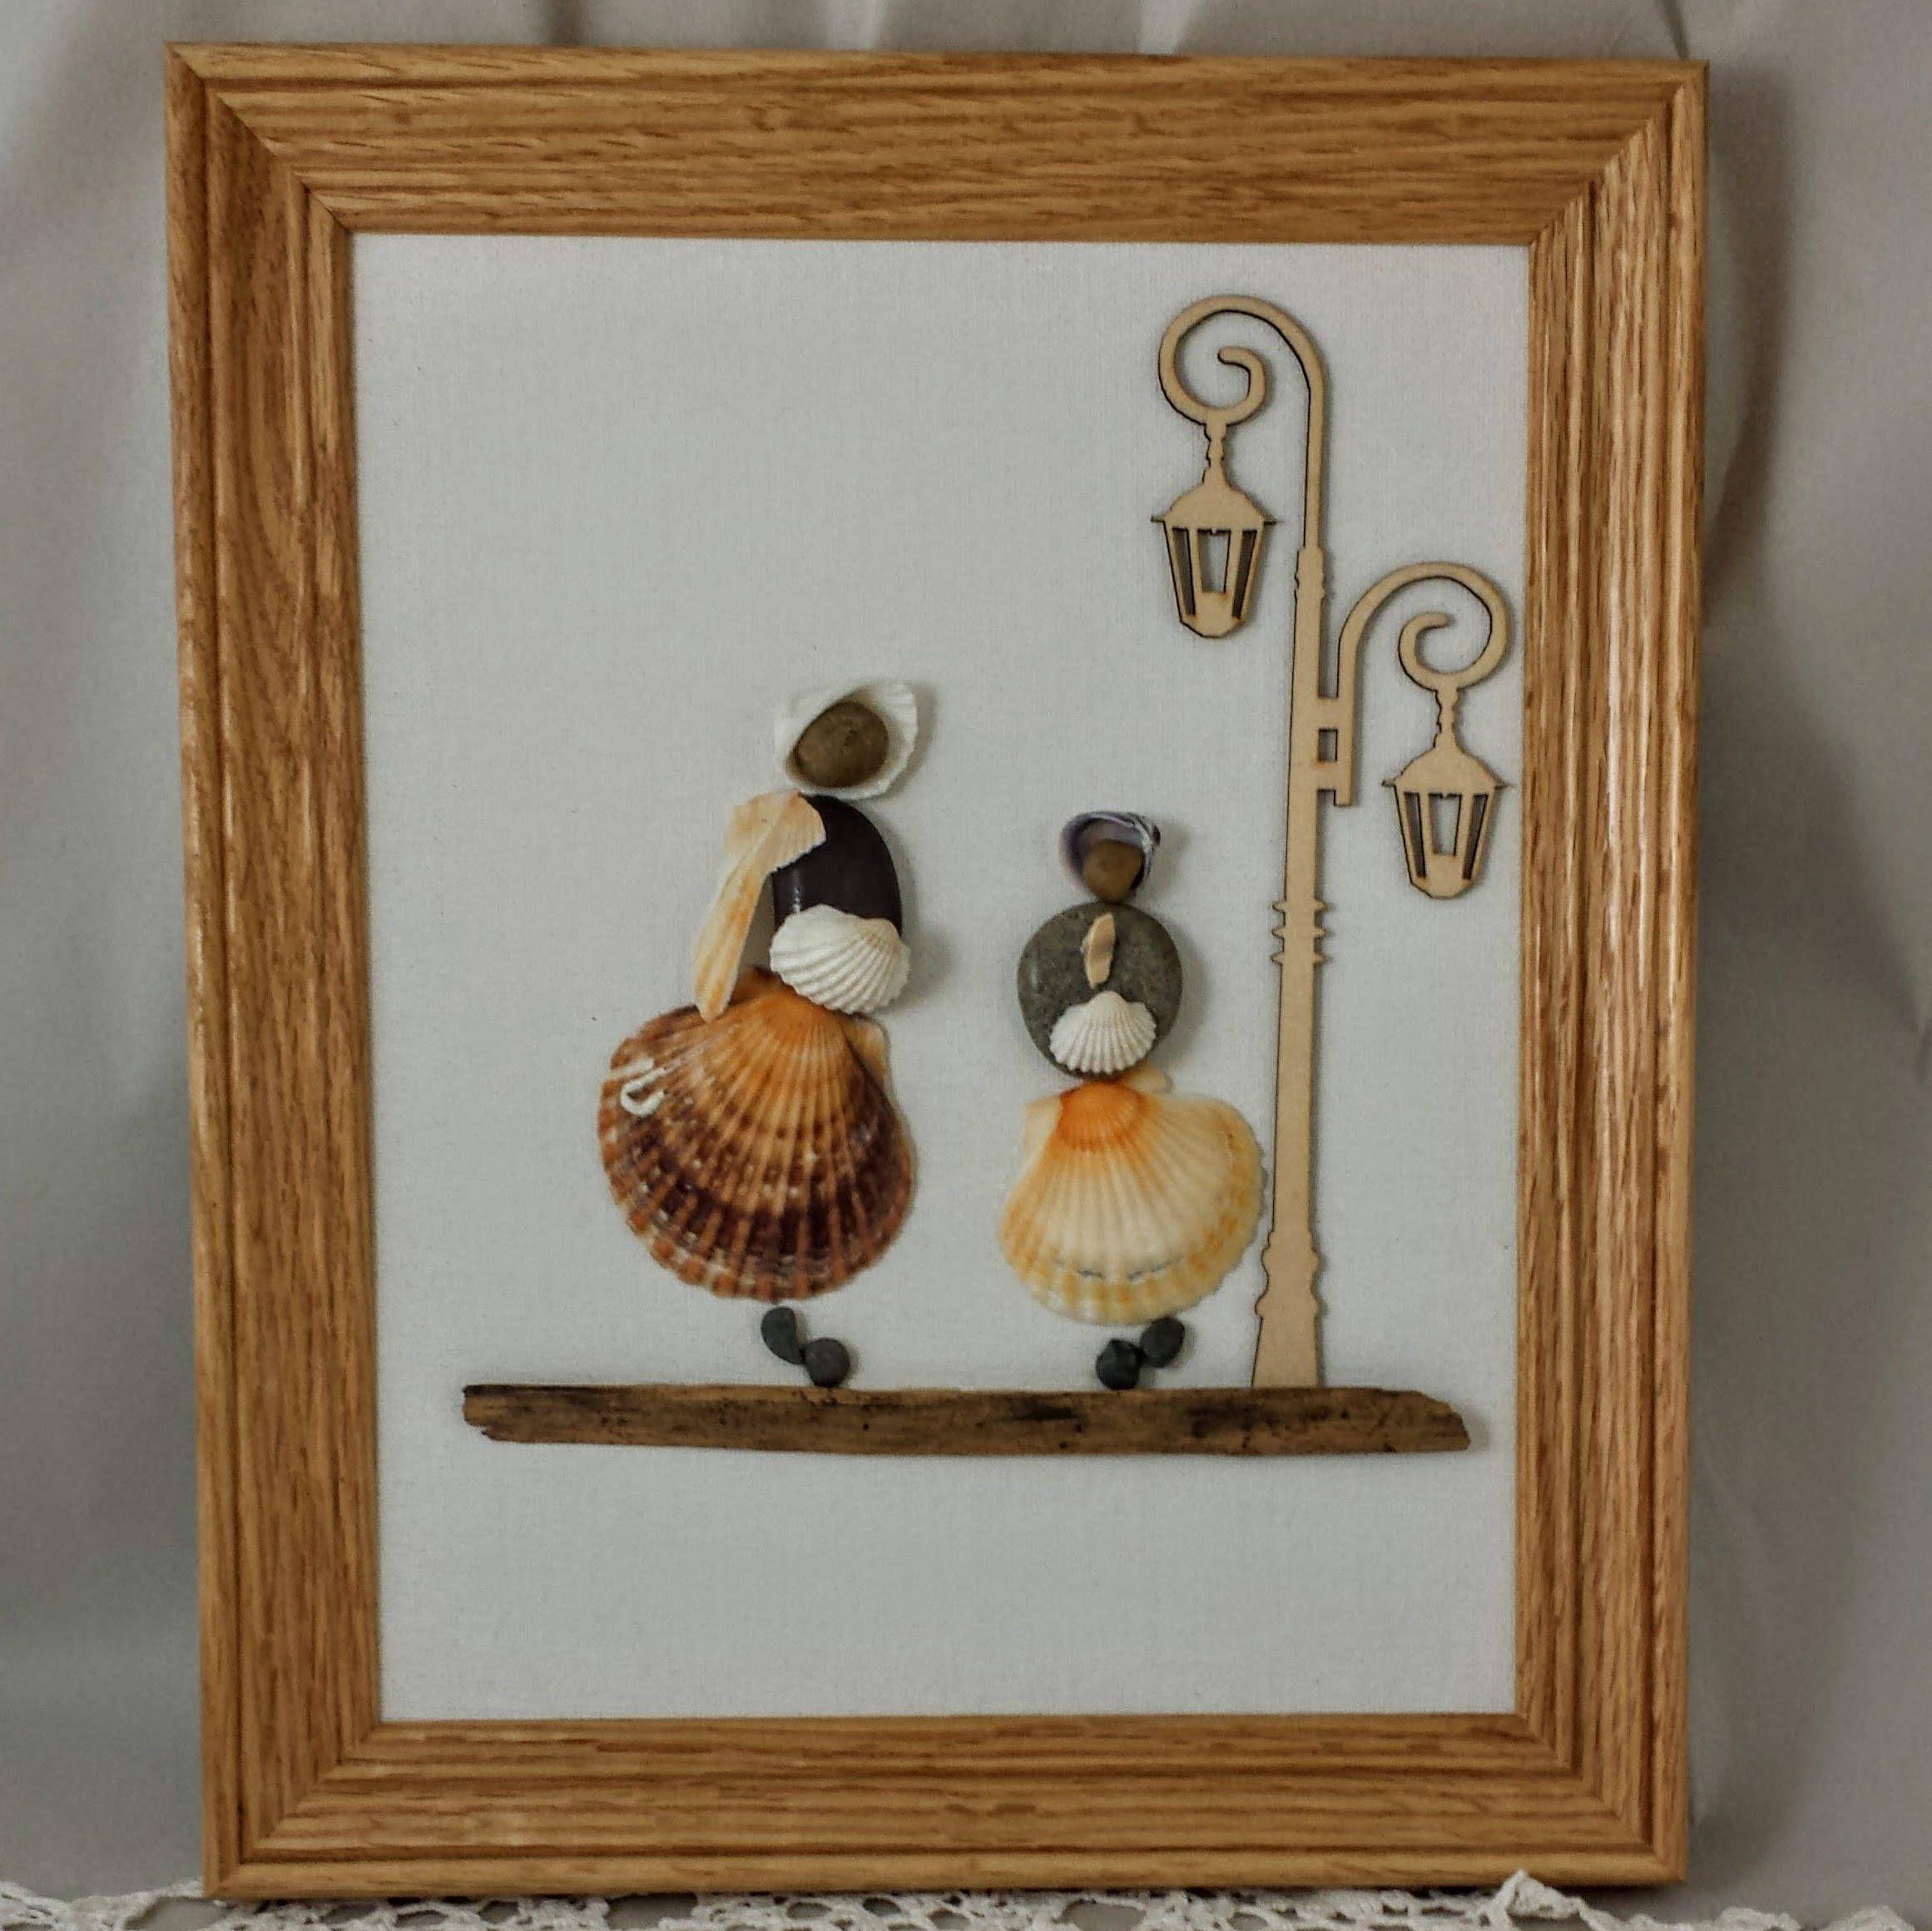 Pebble art shell art frame canvas mother daughter mom mum pebble art shell art frame canvas mother daughter mom jeuxipadfo Choice Image